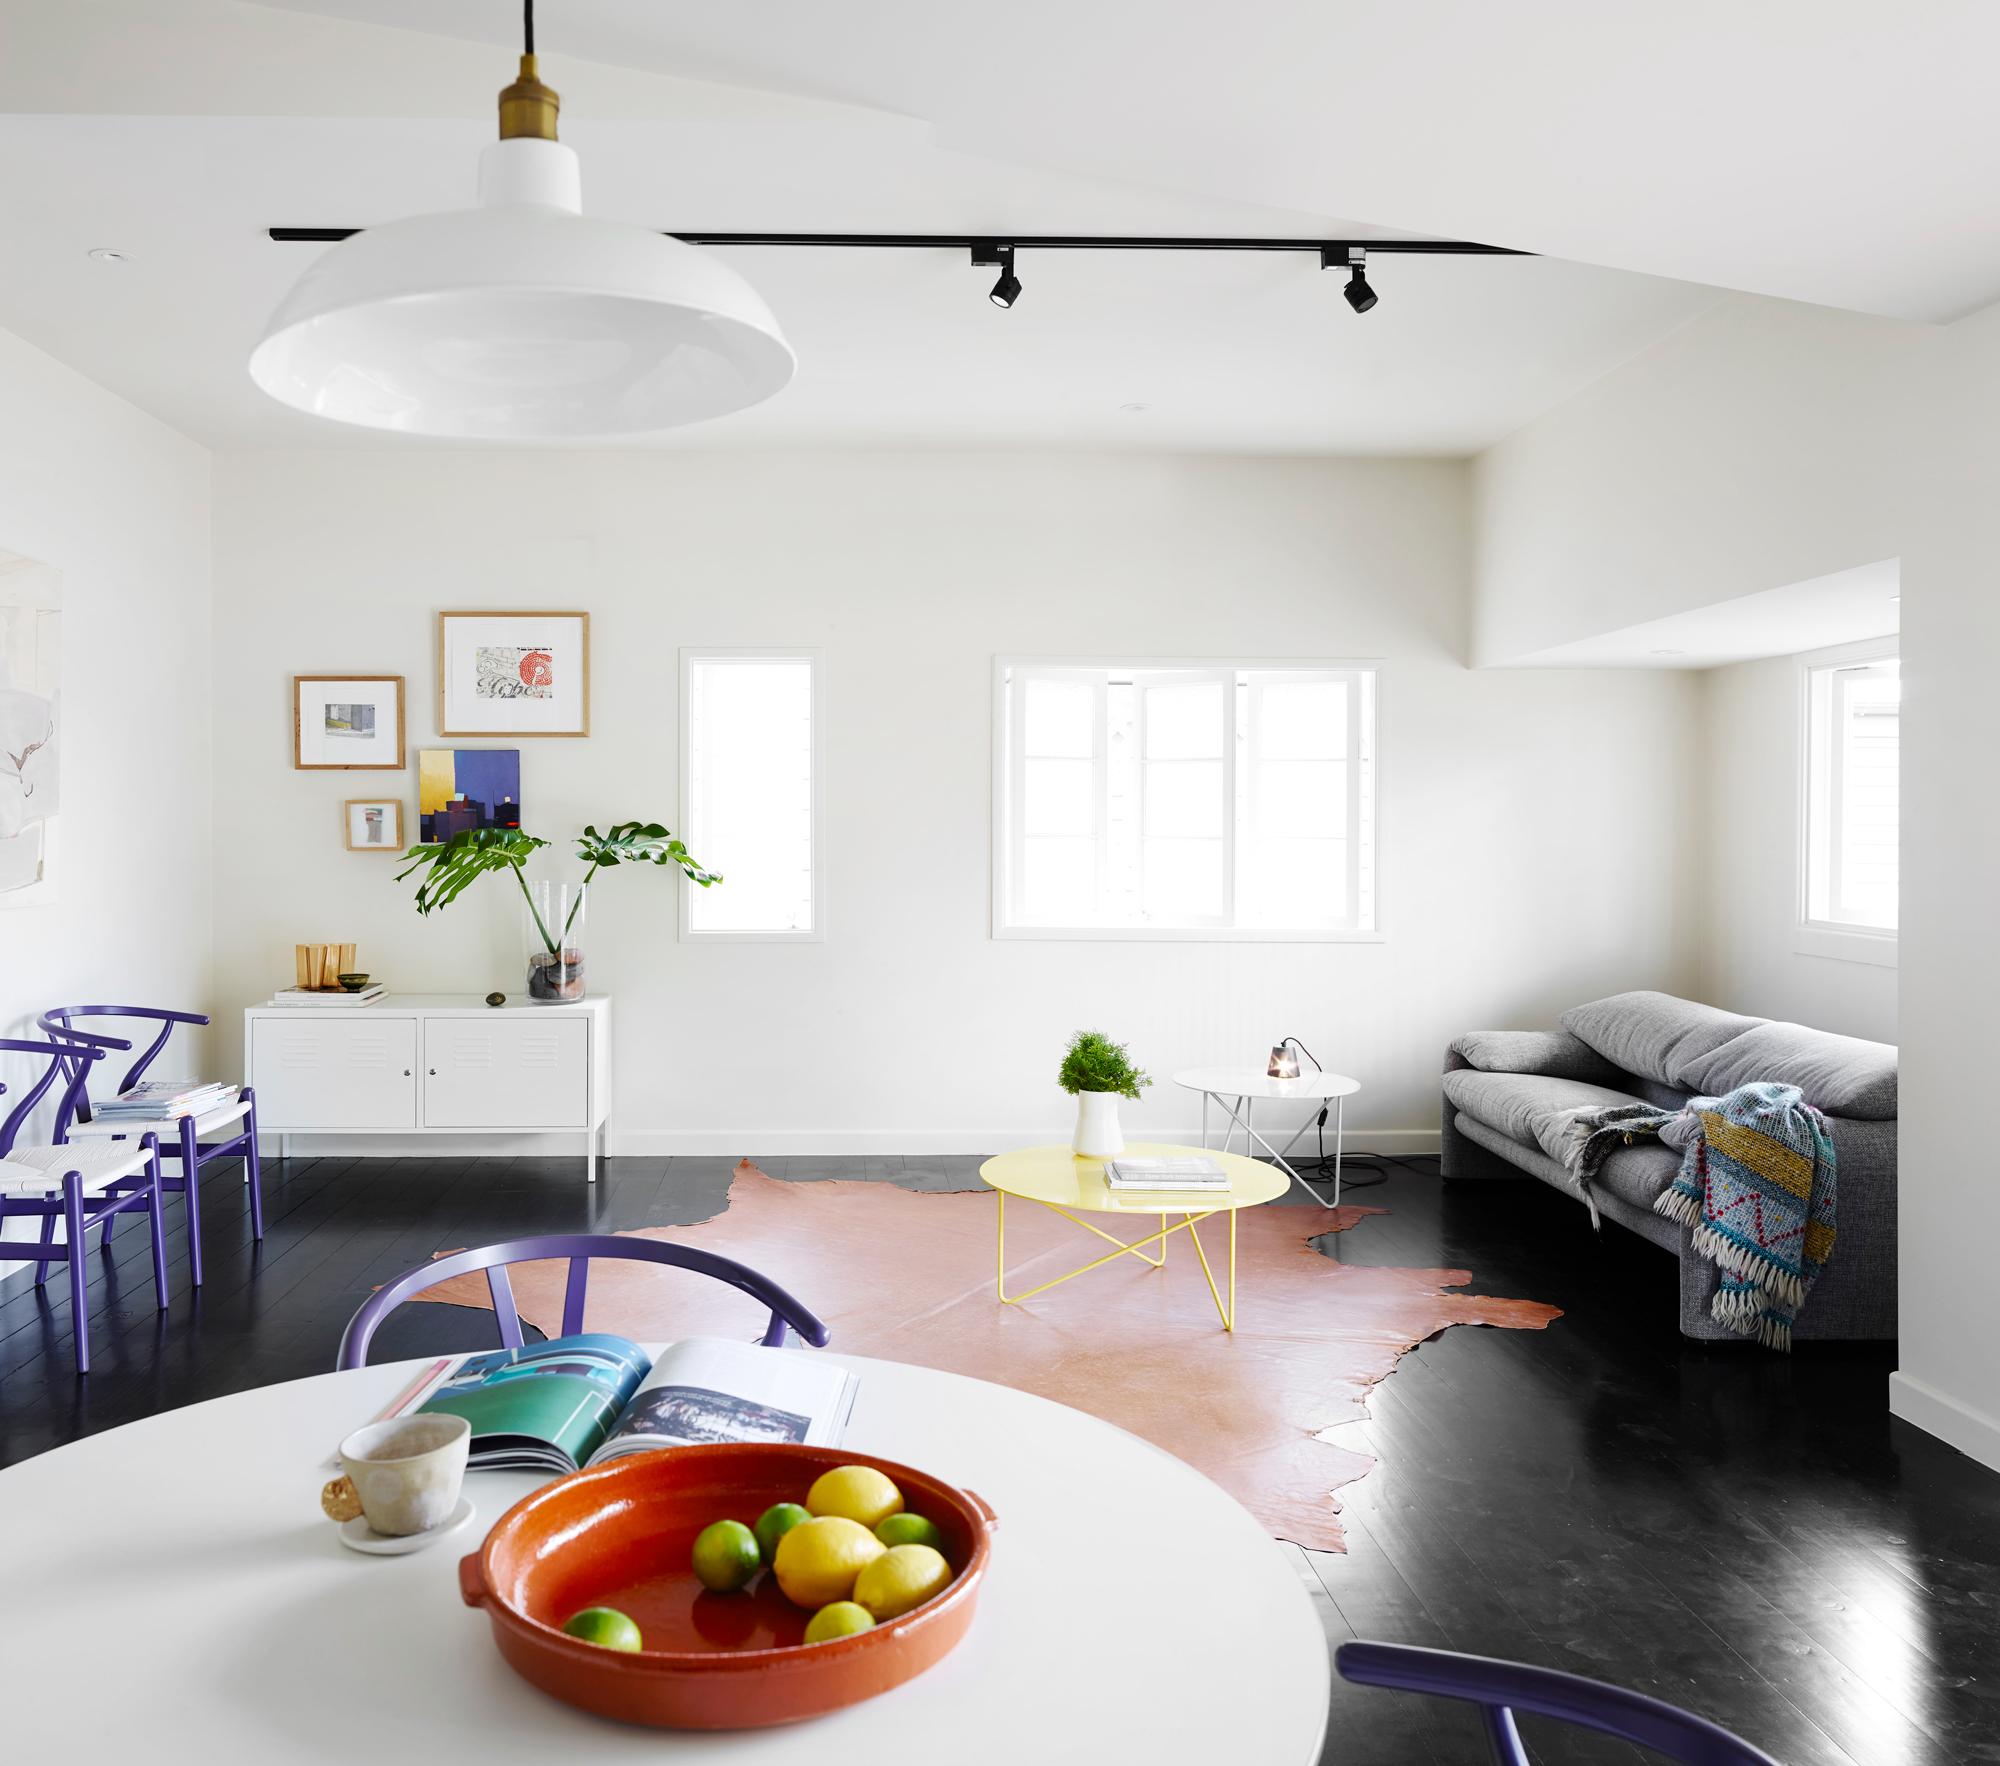 georgia-cannon-interior-designer-brisbane-project-m2-house-017080.jpg